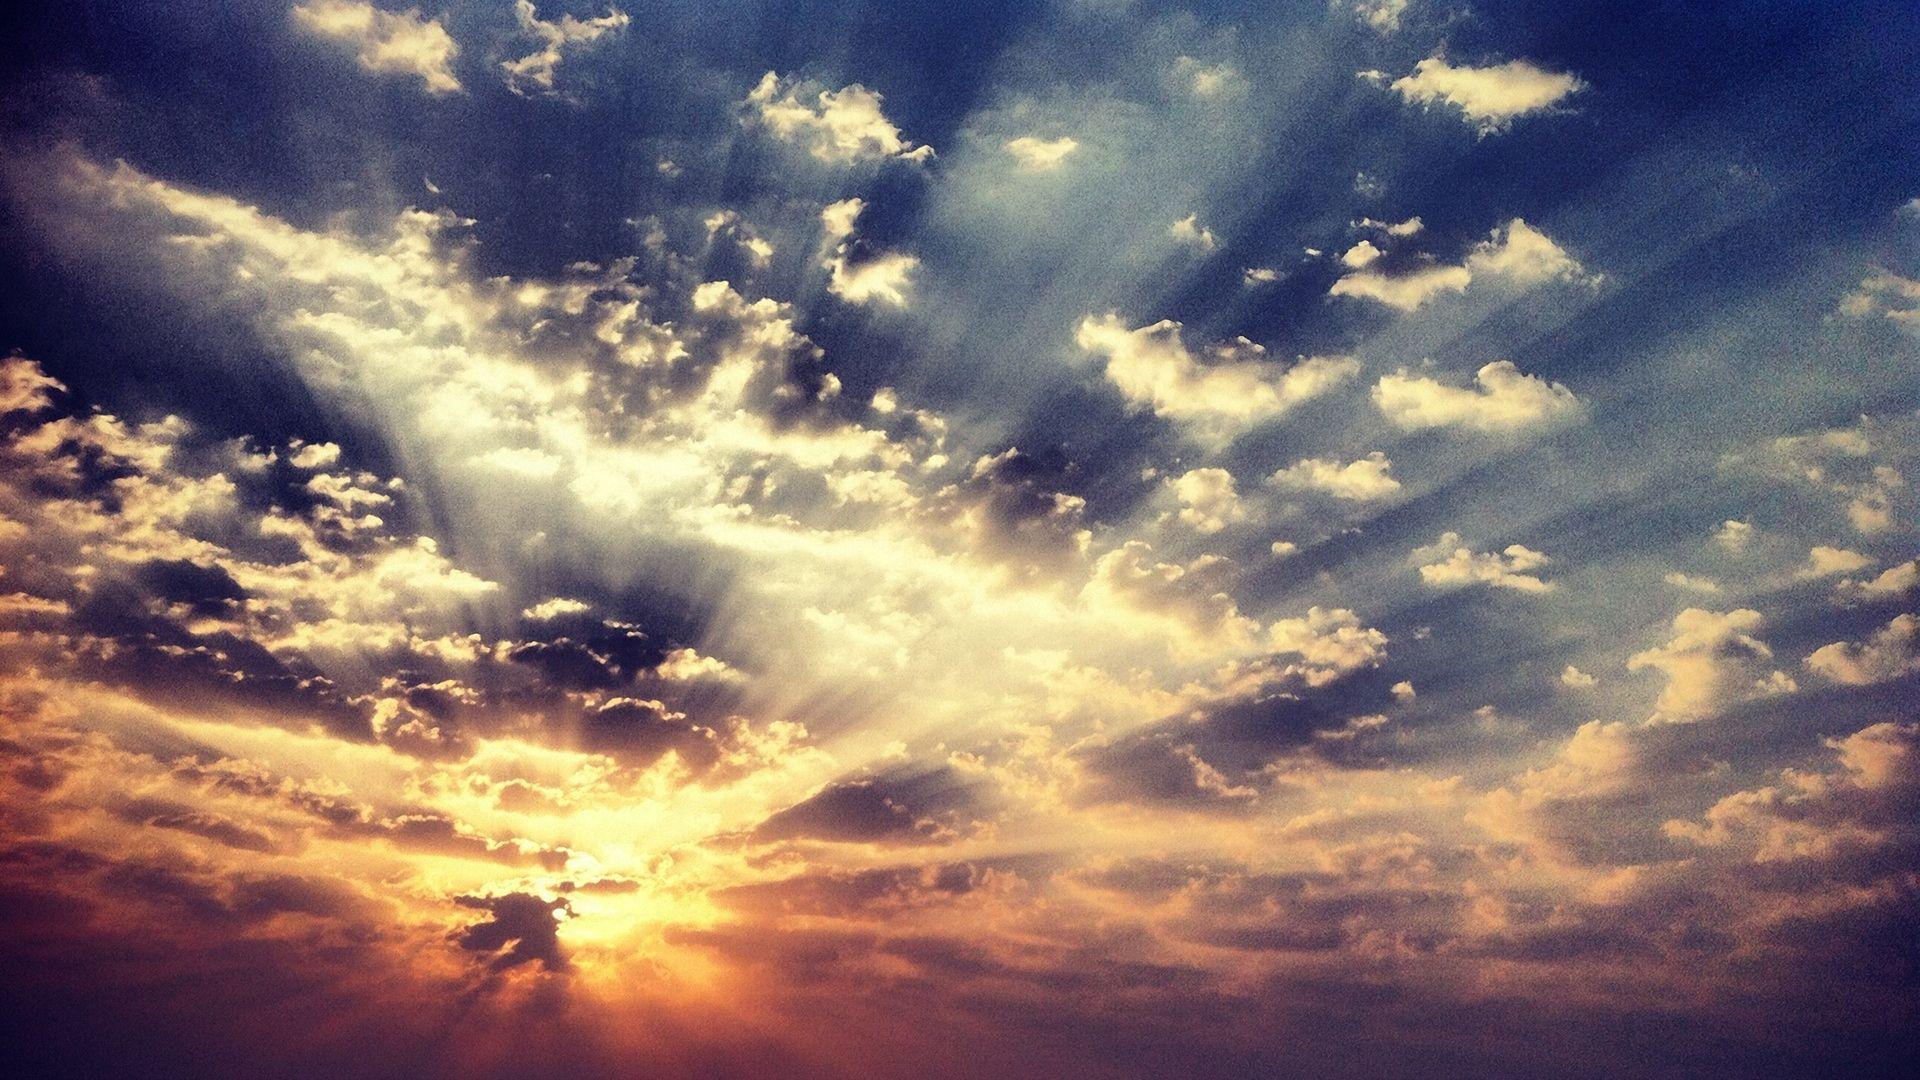 Sky Wallpapers Images Desktop Morning Sky Clouds Background